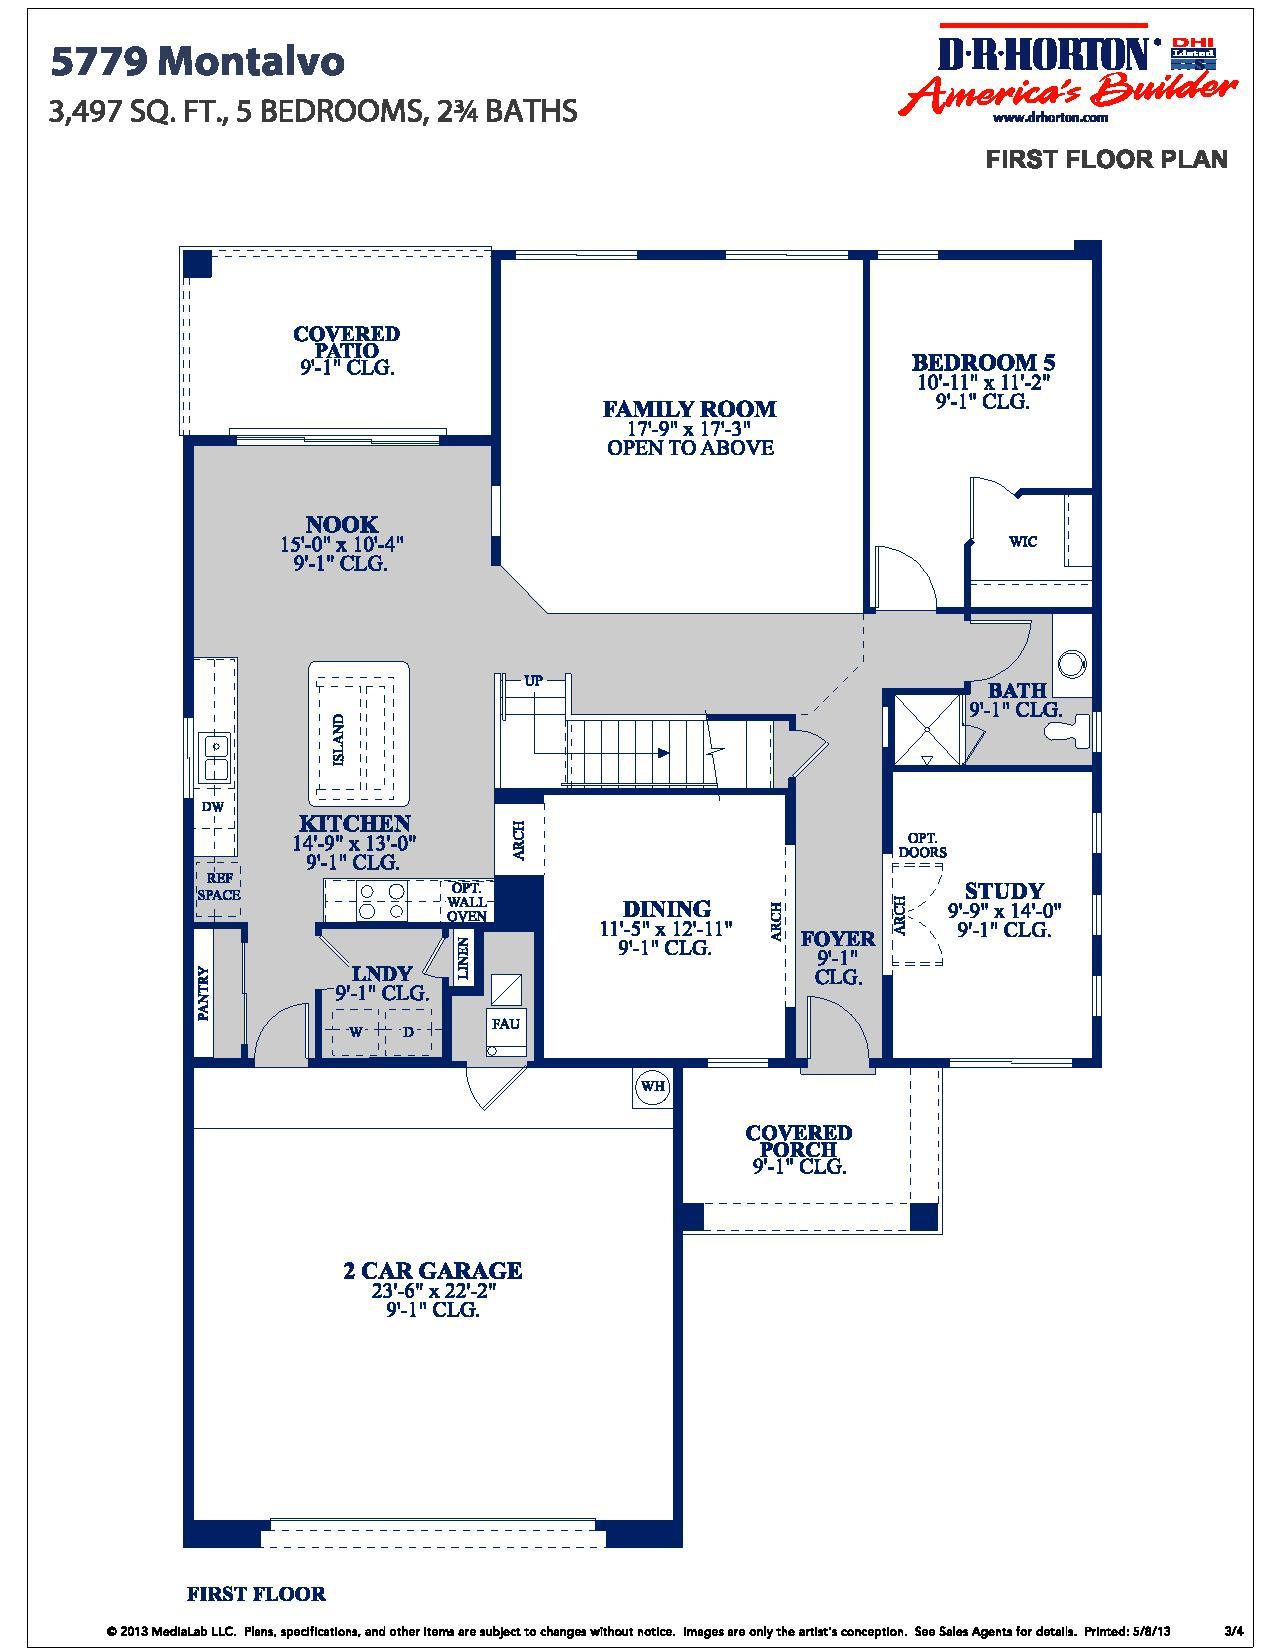 DR Horton Montalvo Floor Plan